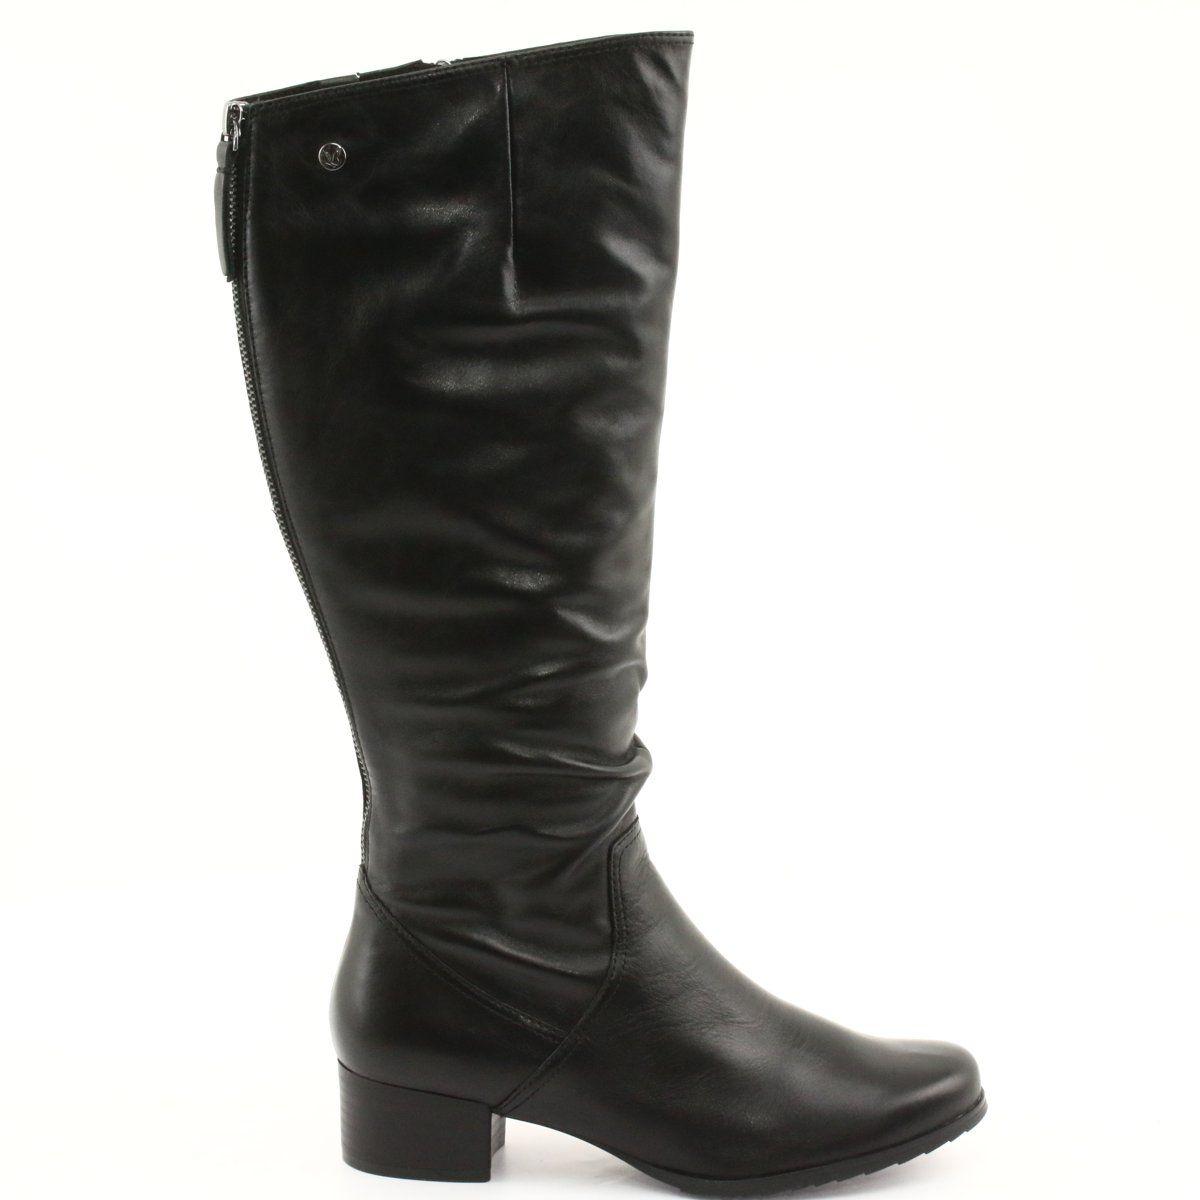 Kozaki Regulowane Caprice 25500 Czarne Boots Black Boots Womens Boots